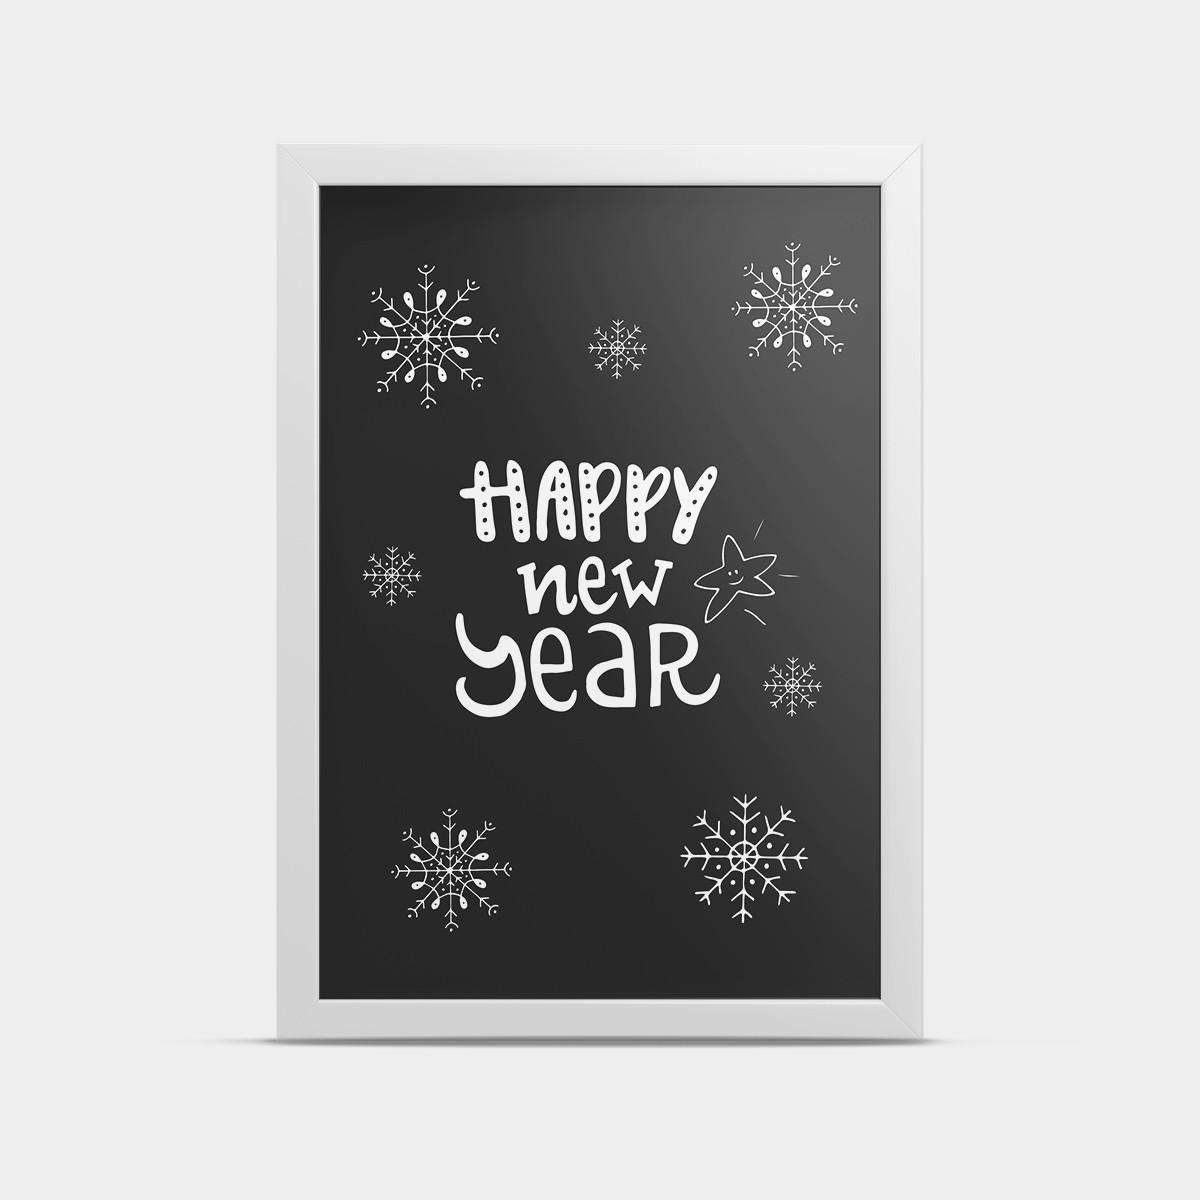 Постер Happy new year Черный 20*30 см